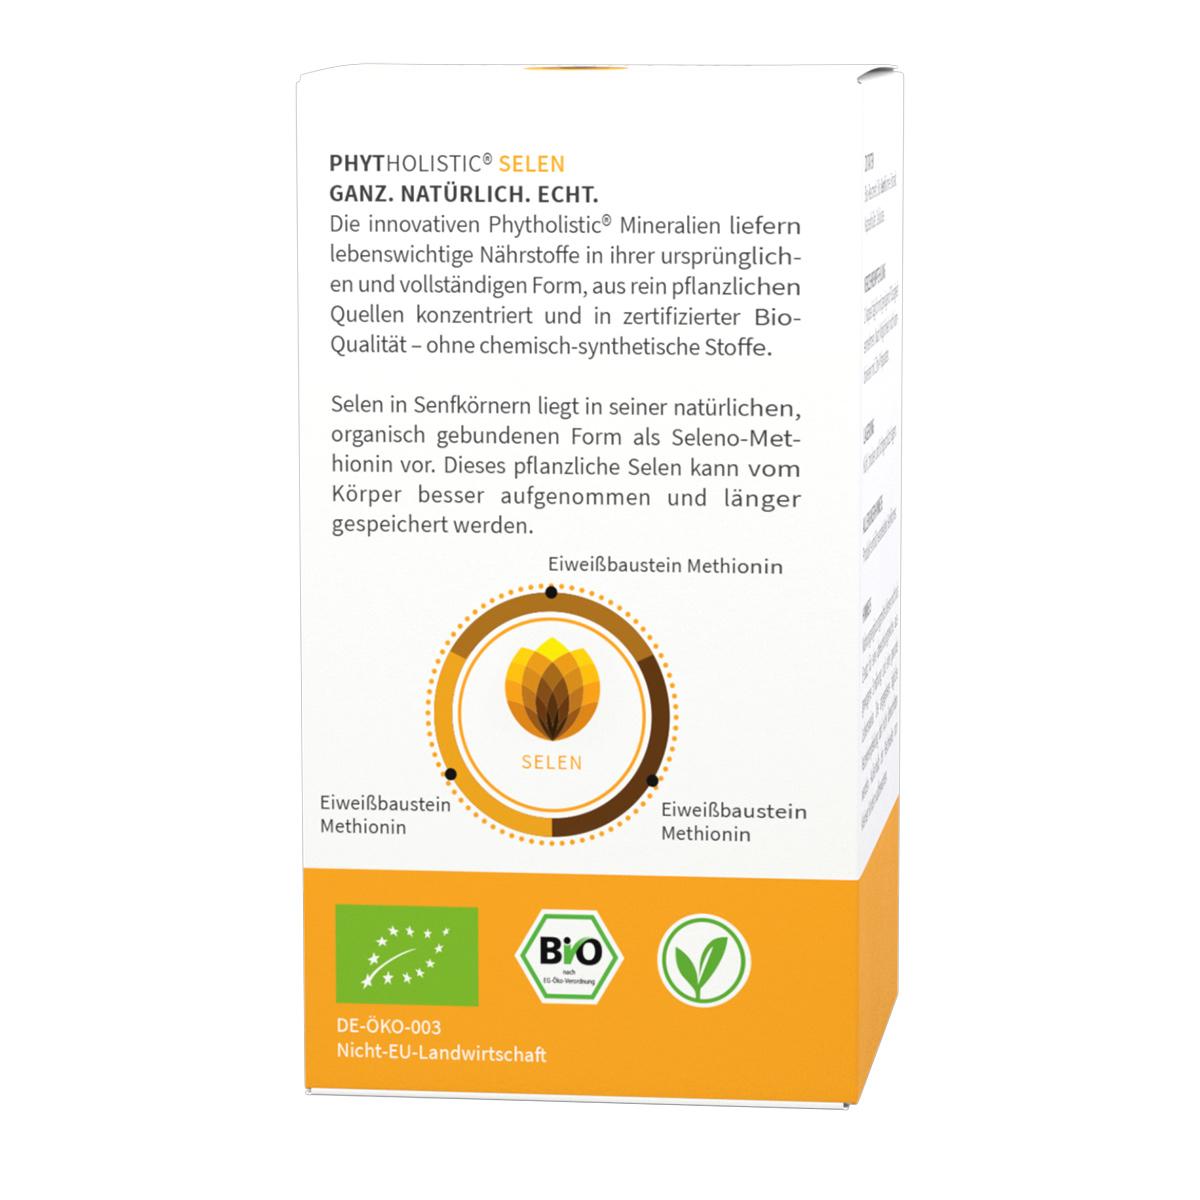 selen-kapseln-bio-rein-pflanzlich-phytholistic-180-stueck-verpackung-hinten-1200x1200